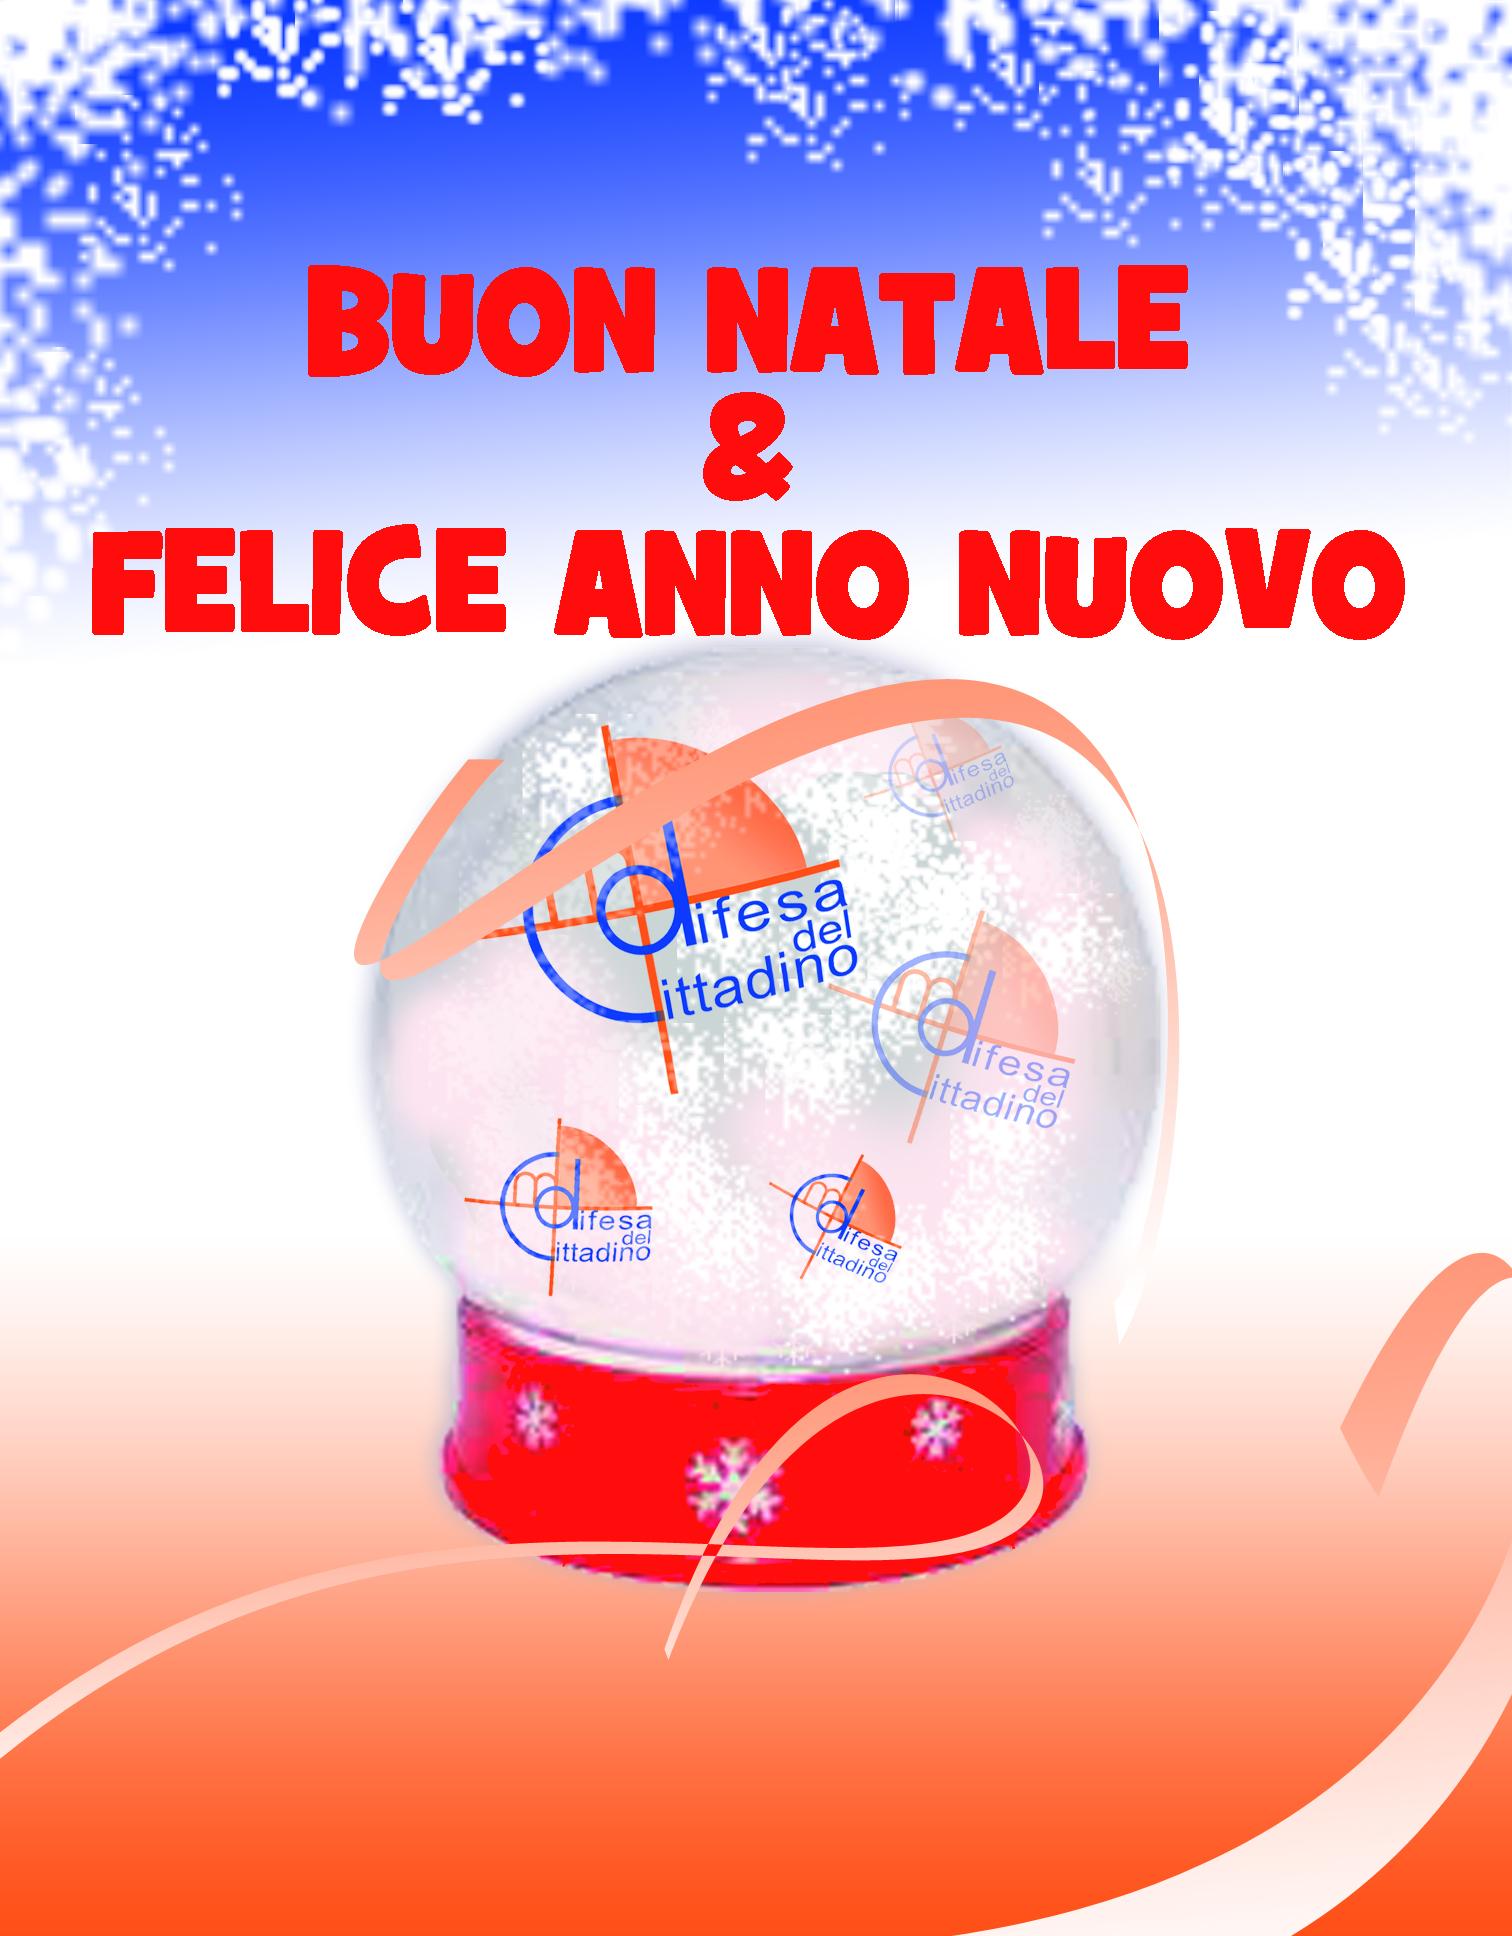 natale 2013